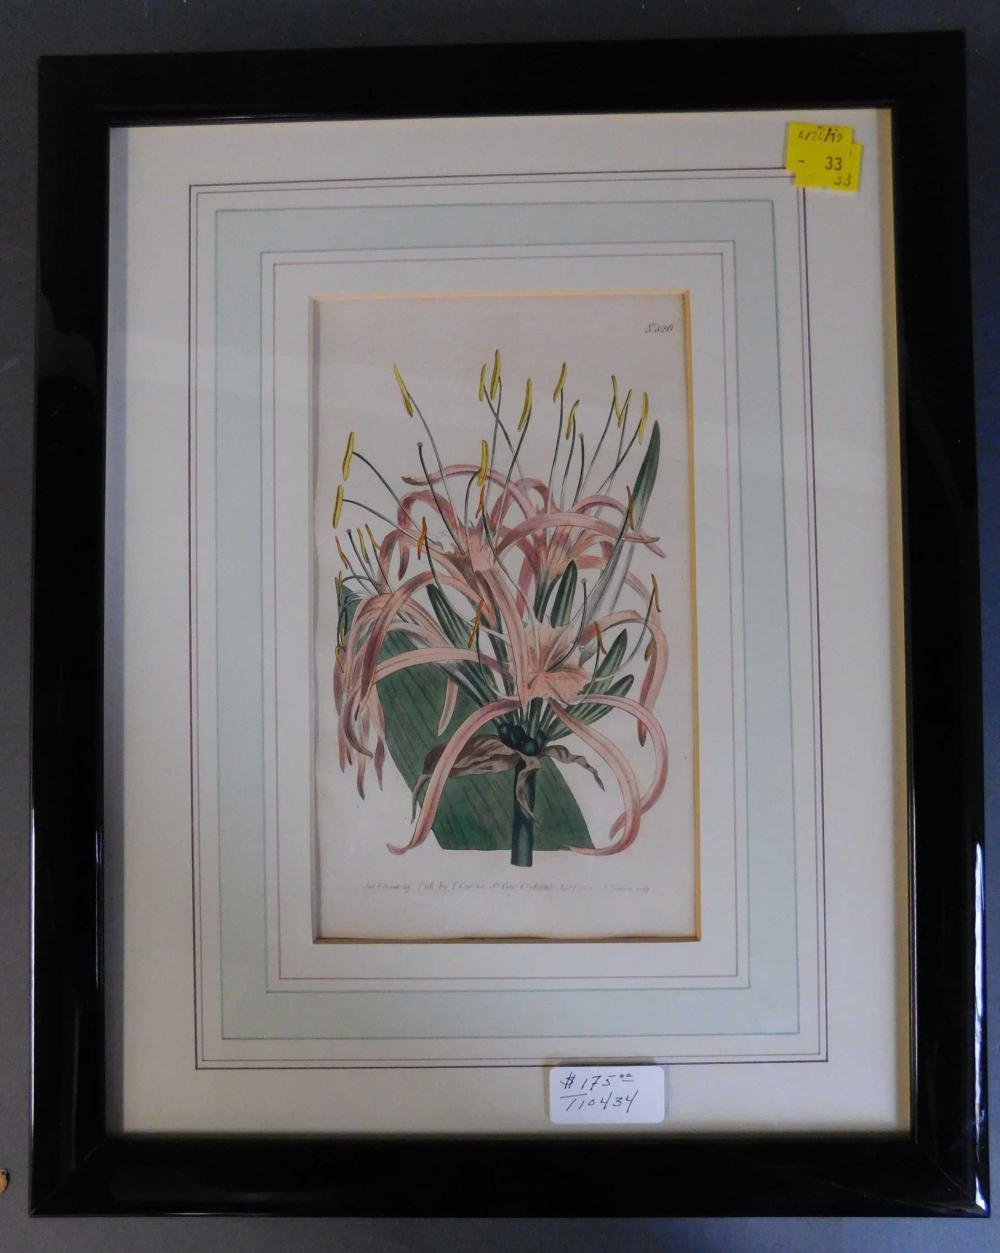 3 floral engravings: Curtis, 1804-1805. Framed.